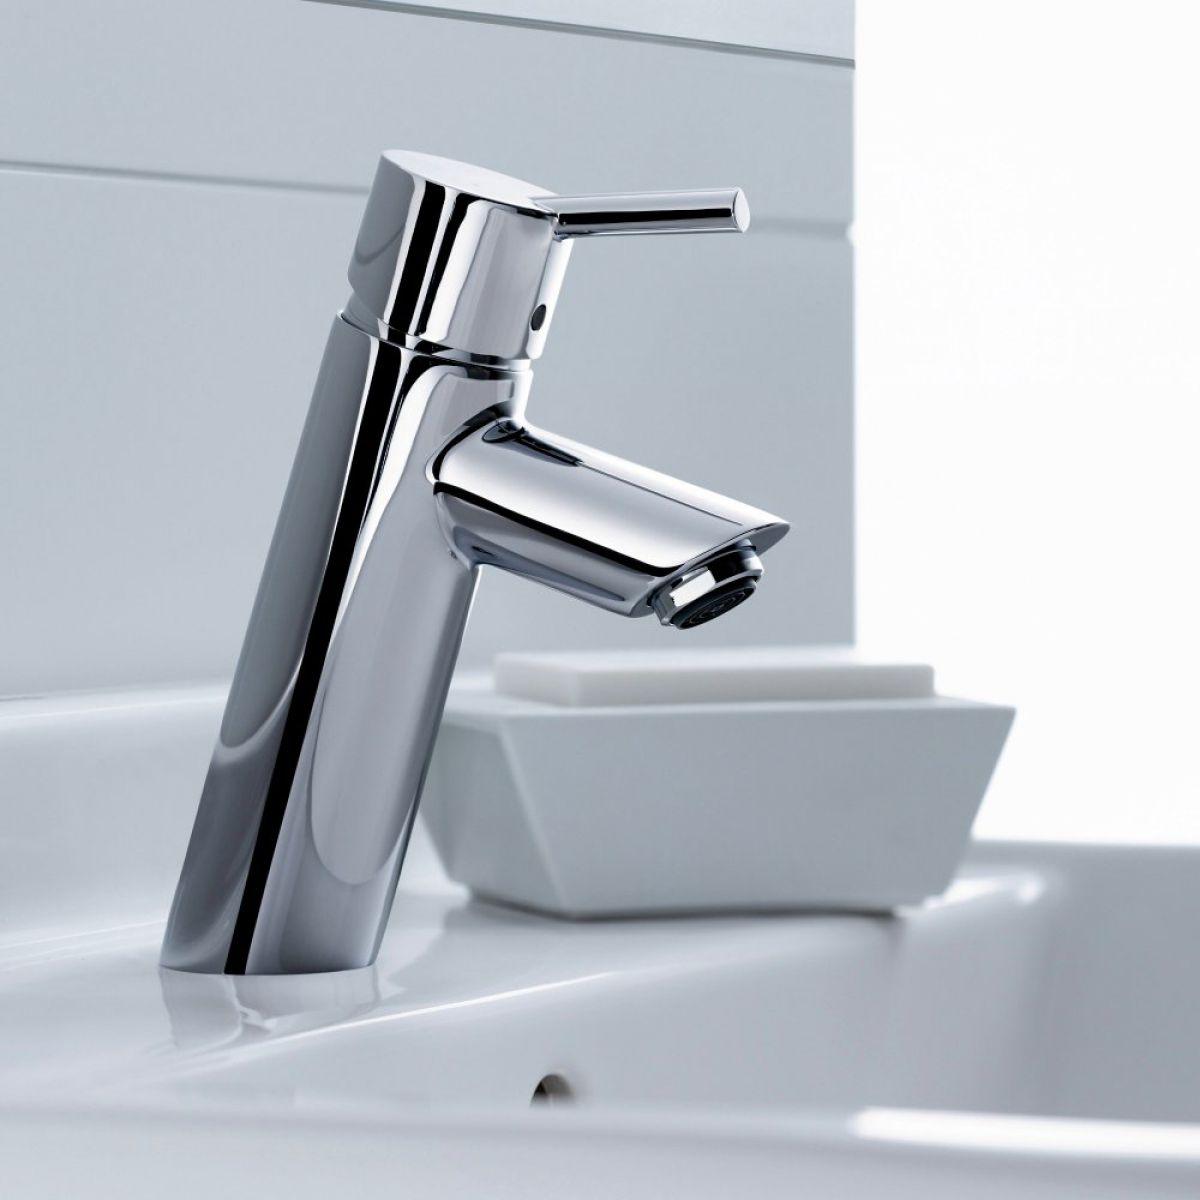 hansgrohe talis 80 single lever basin mixer uk bathrooms. Black Bedroom Furniture Sets. Home Design Ideas